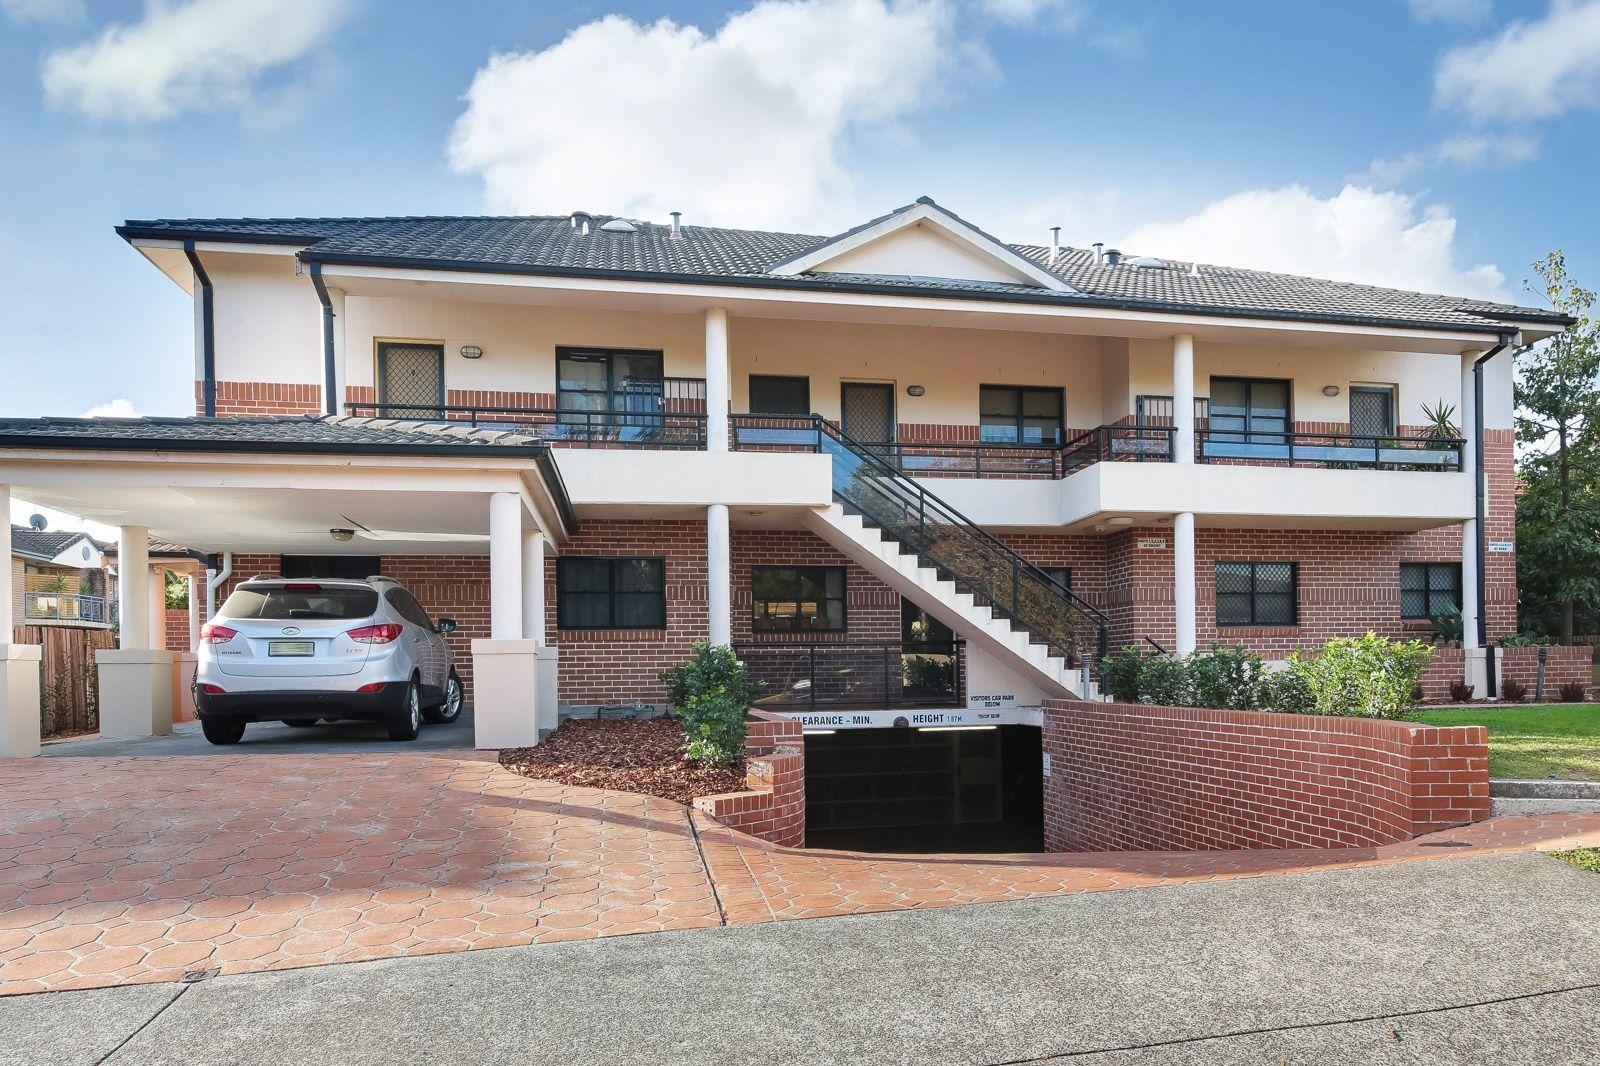 11/553 Mowbray Rd, Lane Cove North NSW 2066, Image 0